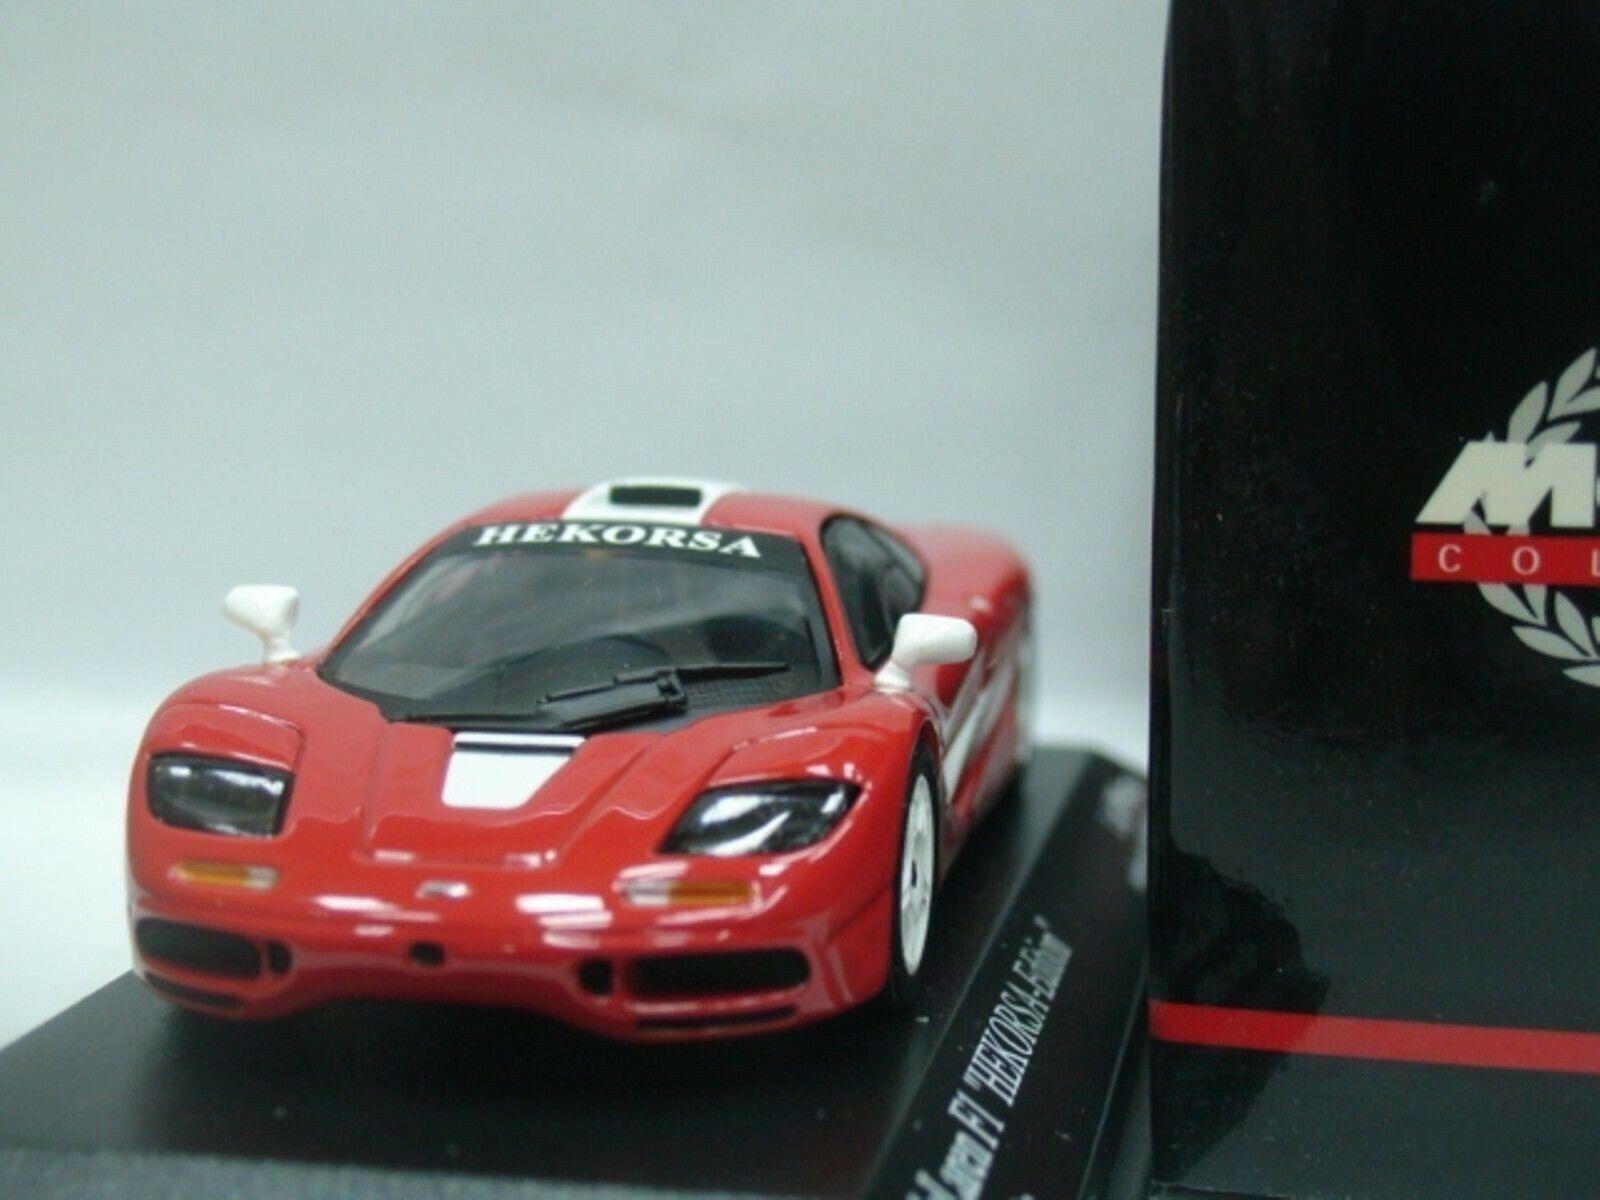 WOW EXTREMELY RARE McLaren BMW F1 GTR SWB Red White Ltd 999 1 43 Minichamps-GT